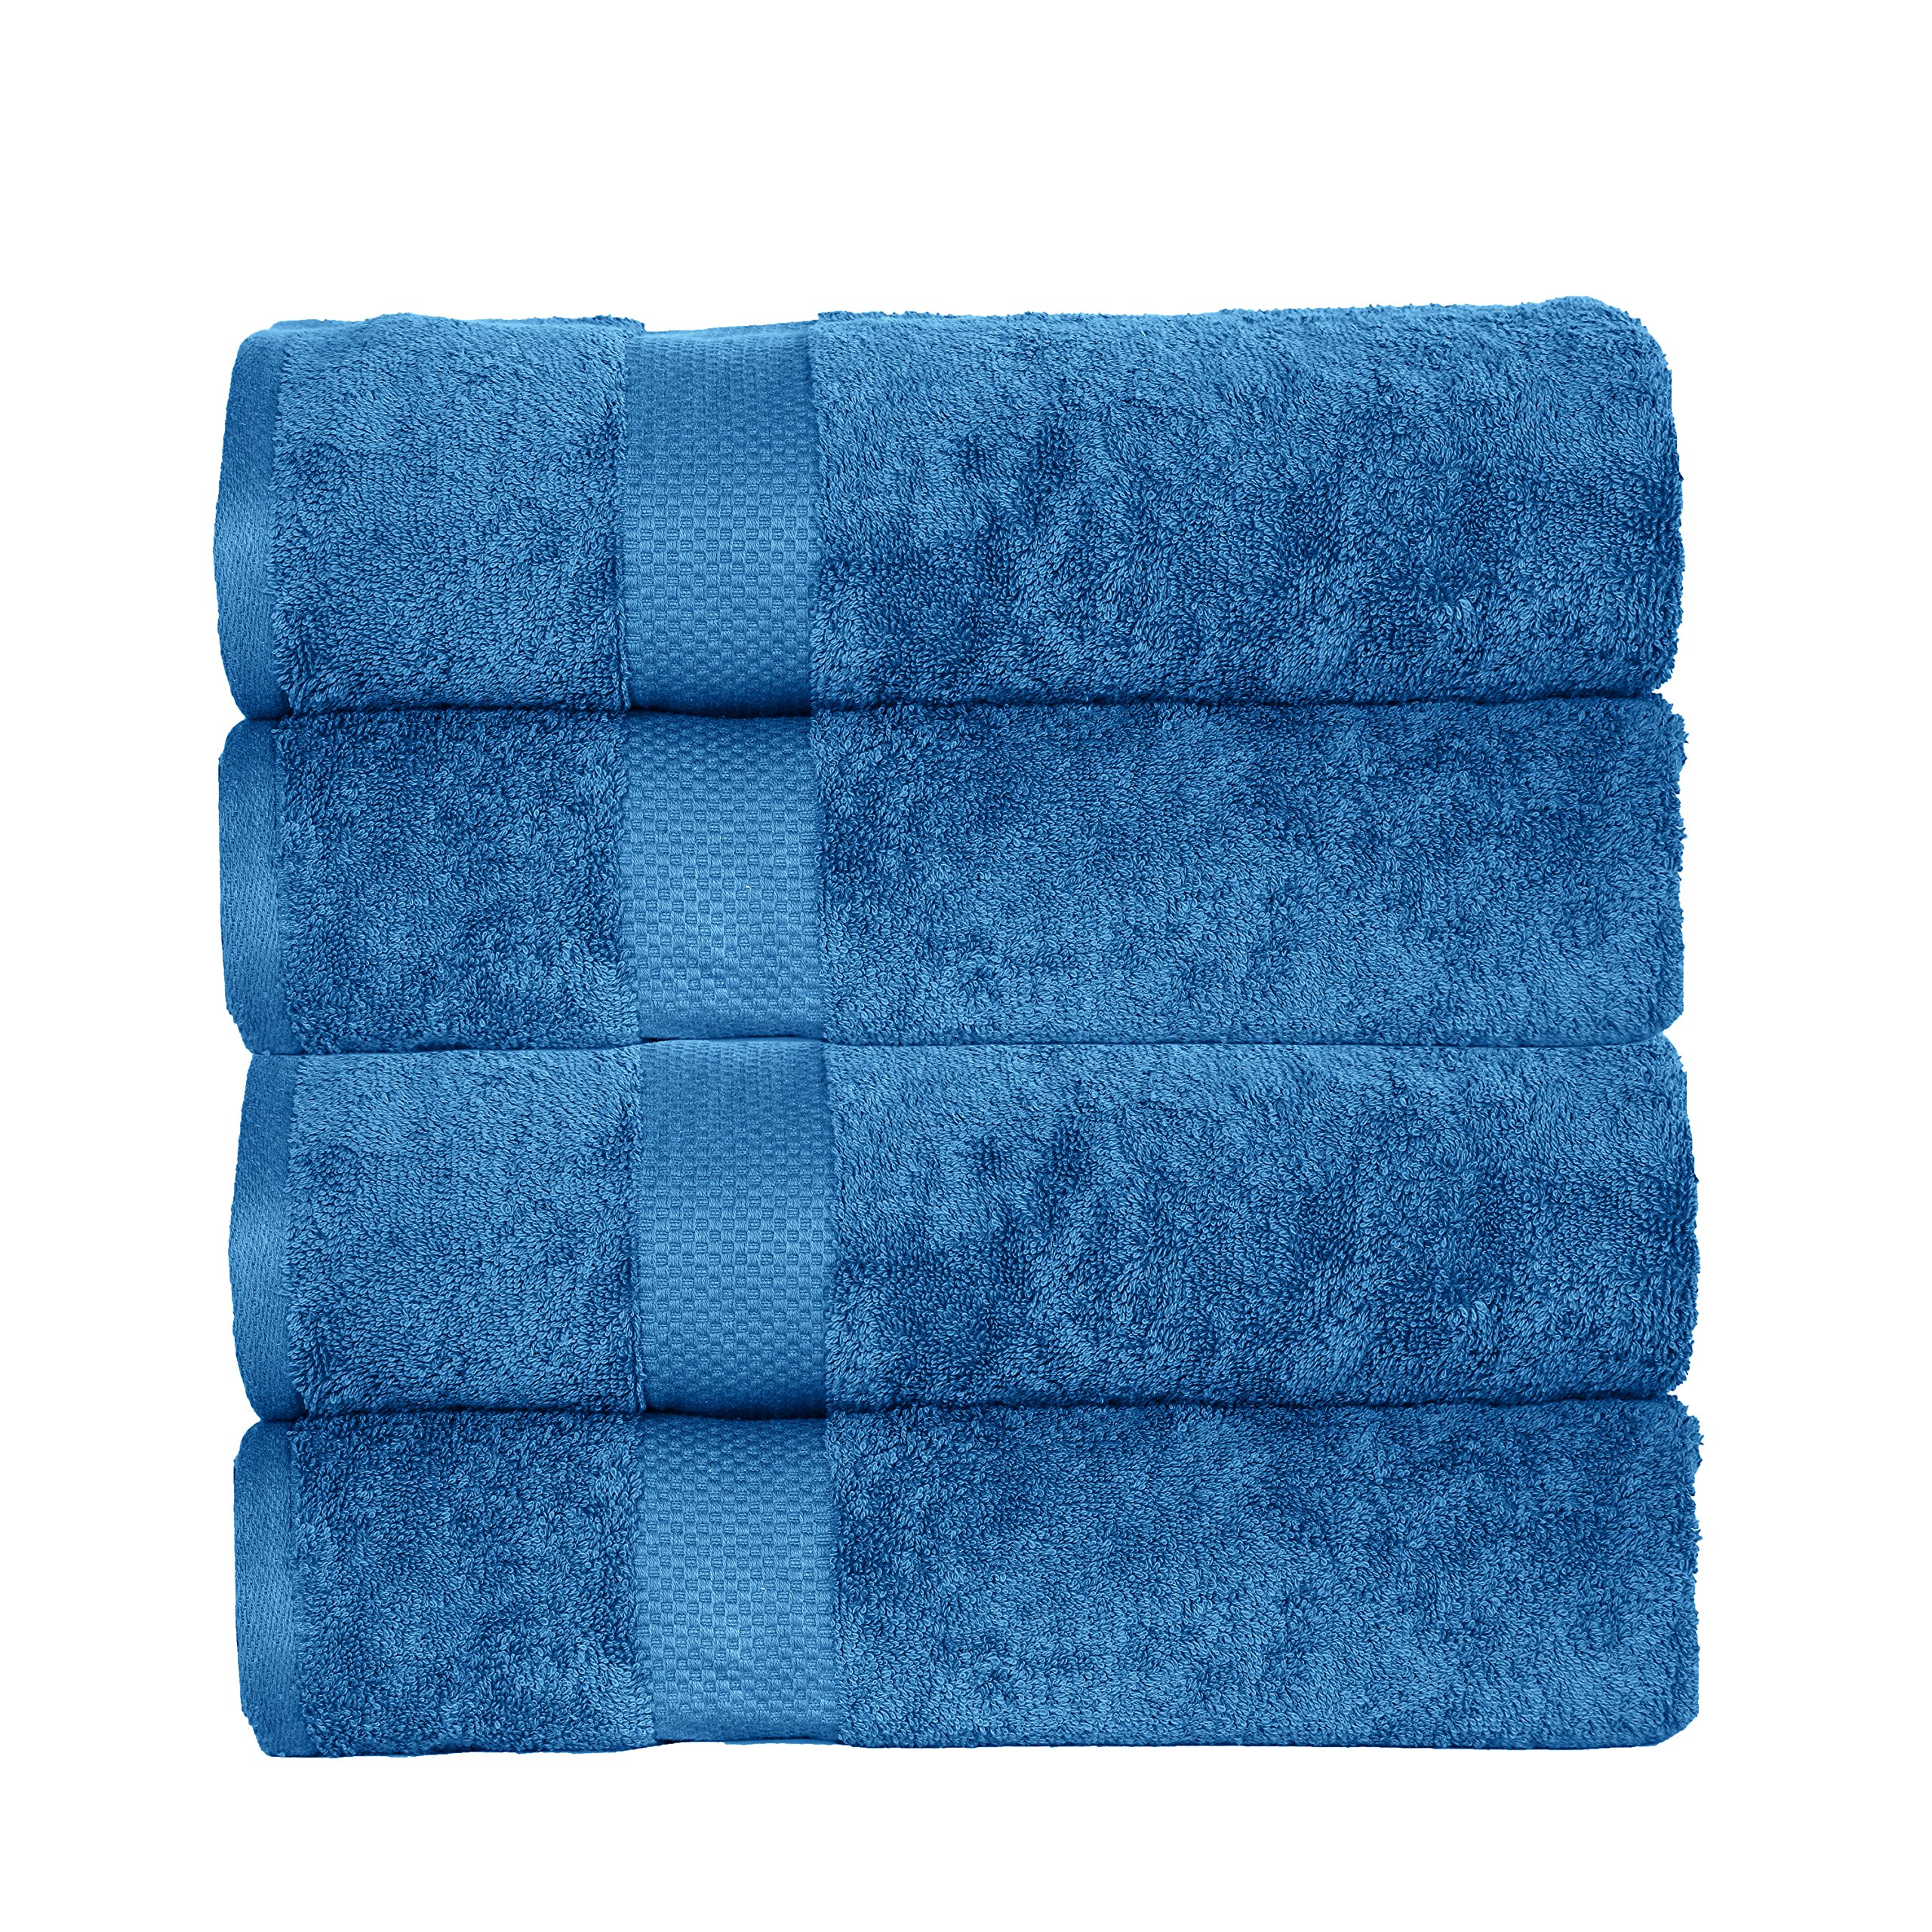 Casa Platino Elegance Spa ESP4 100% Combed Cotton Oversized 4 Piece Bath Sheets, Blue Stone